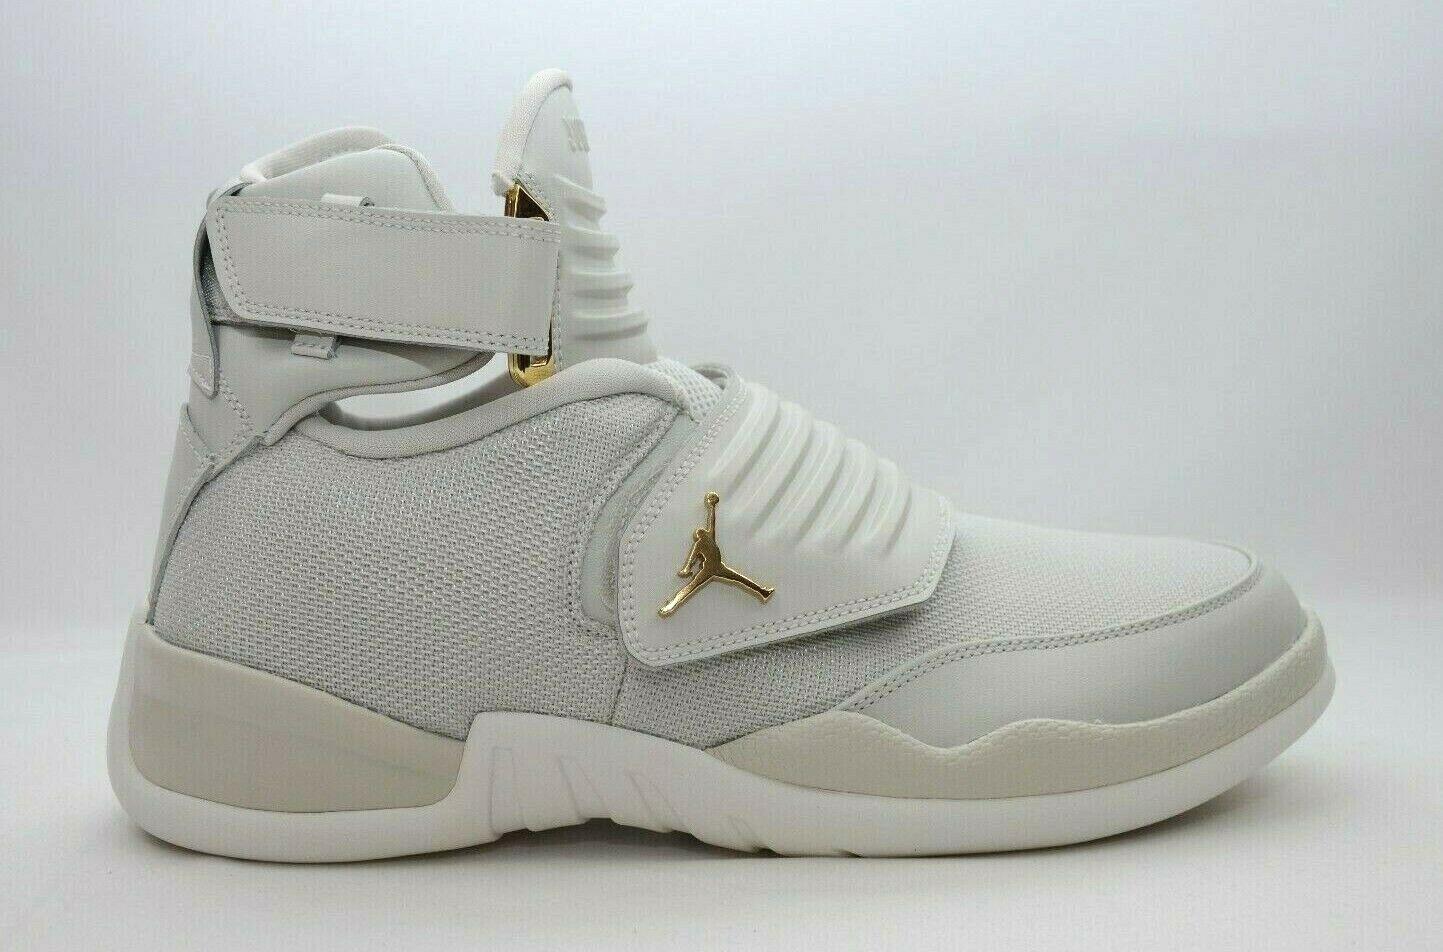 2a13fd29a295 Nike Air Jordan Generation 23 Men s Basketball Shoes Aa1294 005 Size ...